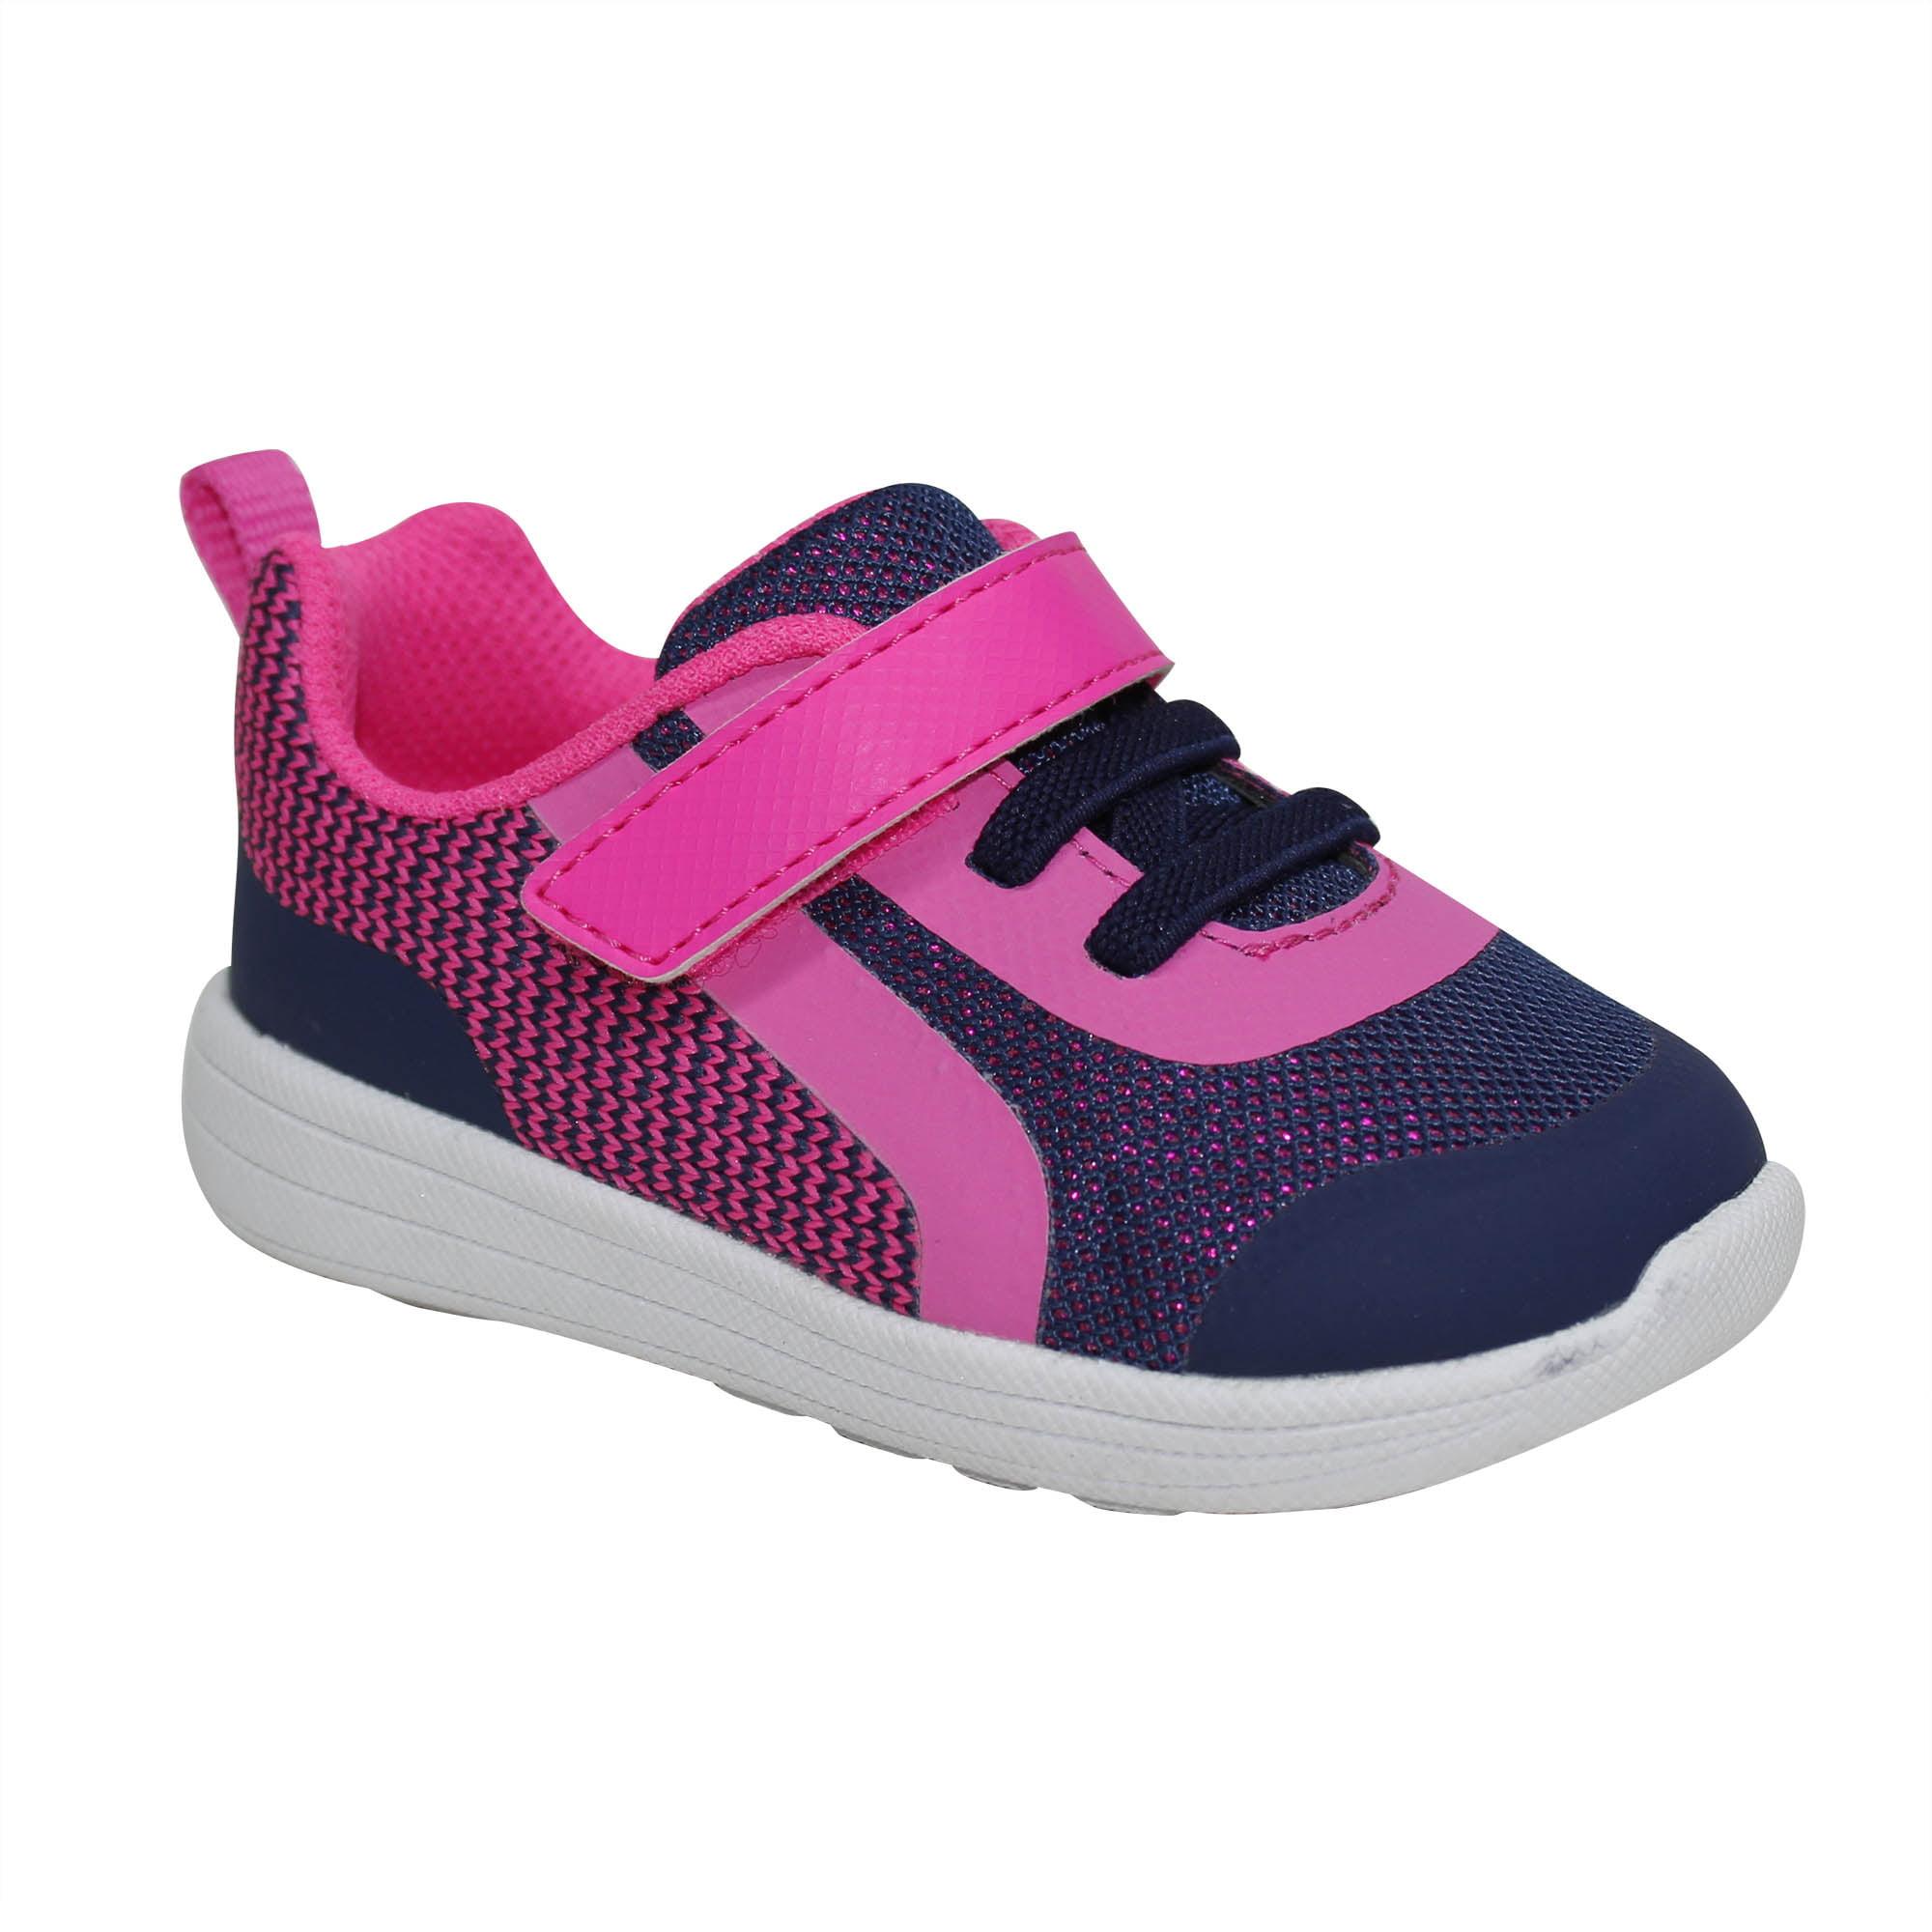 dd74754ab21a1d Garanimals Girl s Pre-Walk Lightweight Athletic Shoe – Walmart ...